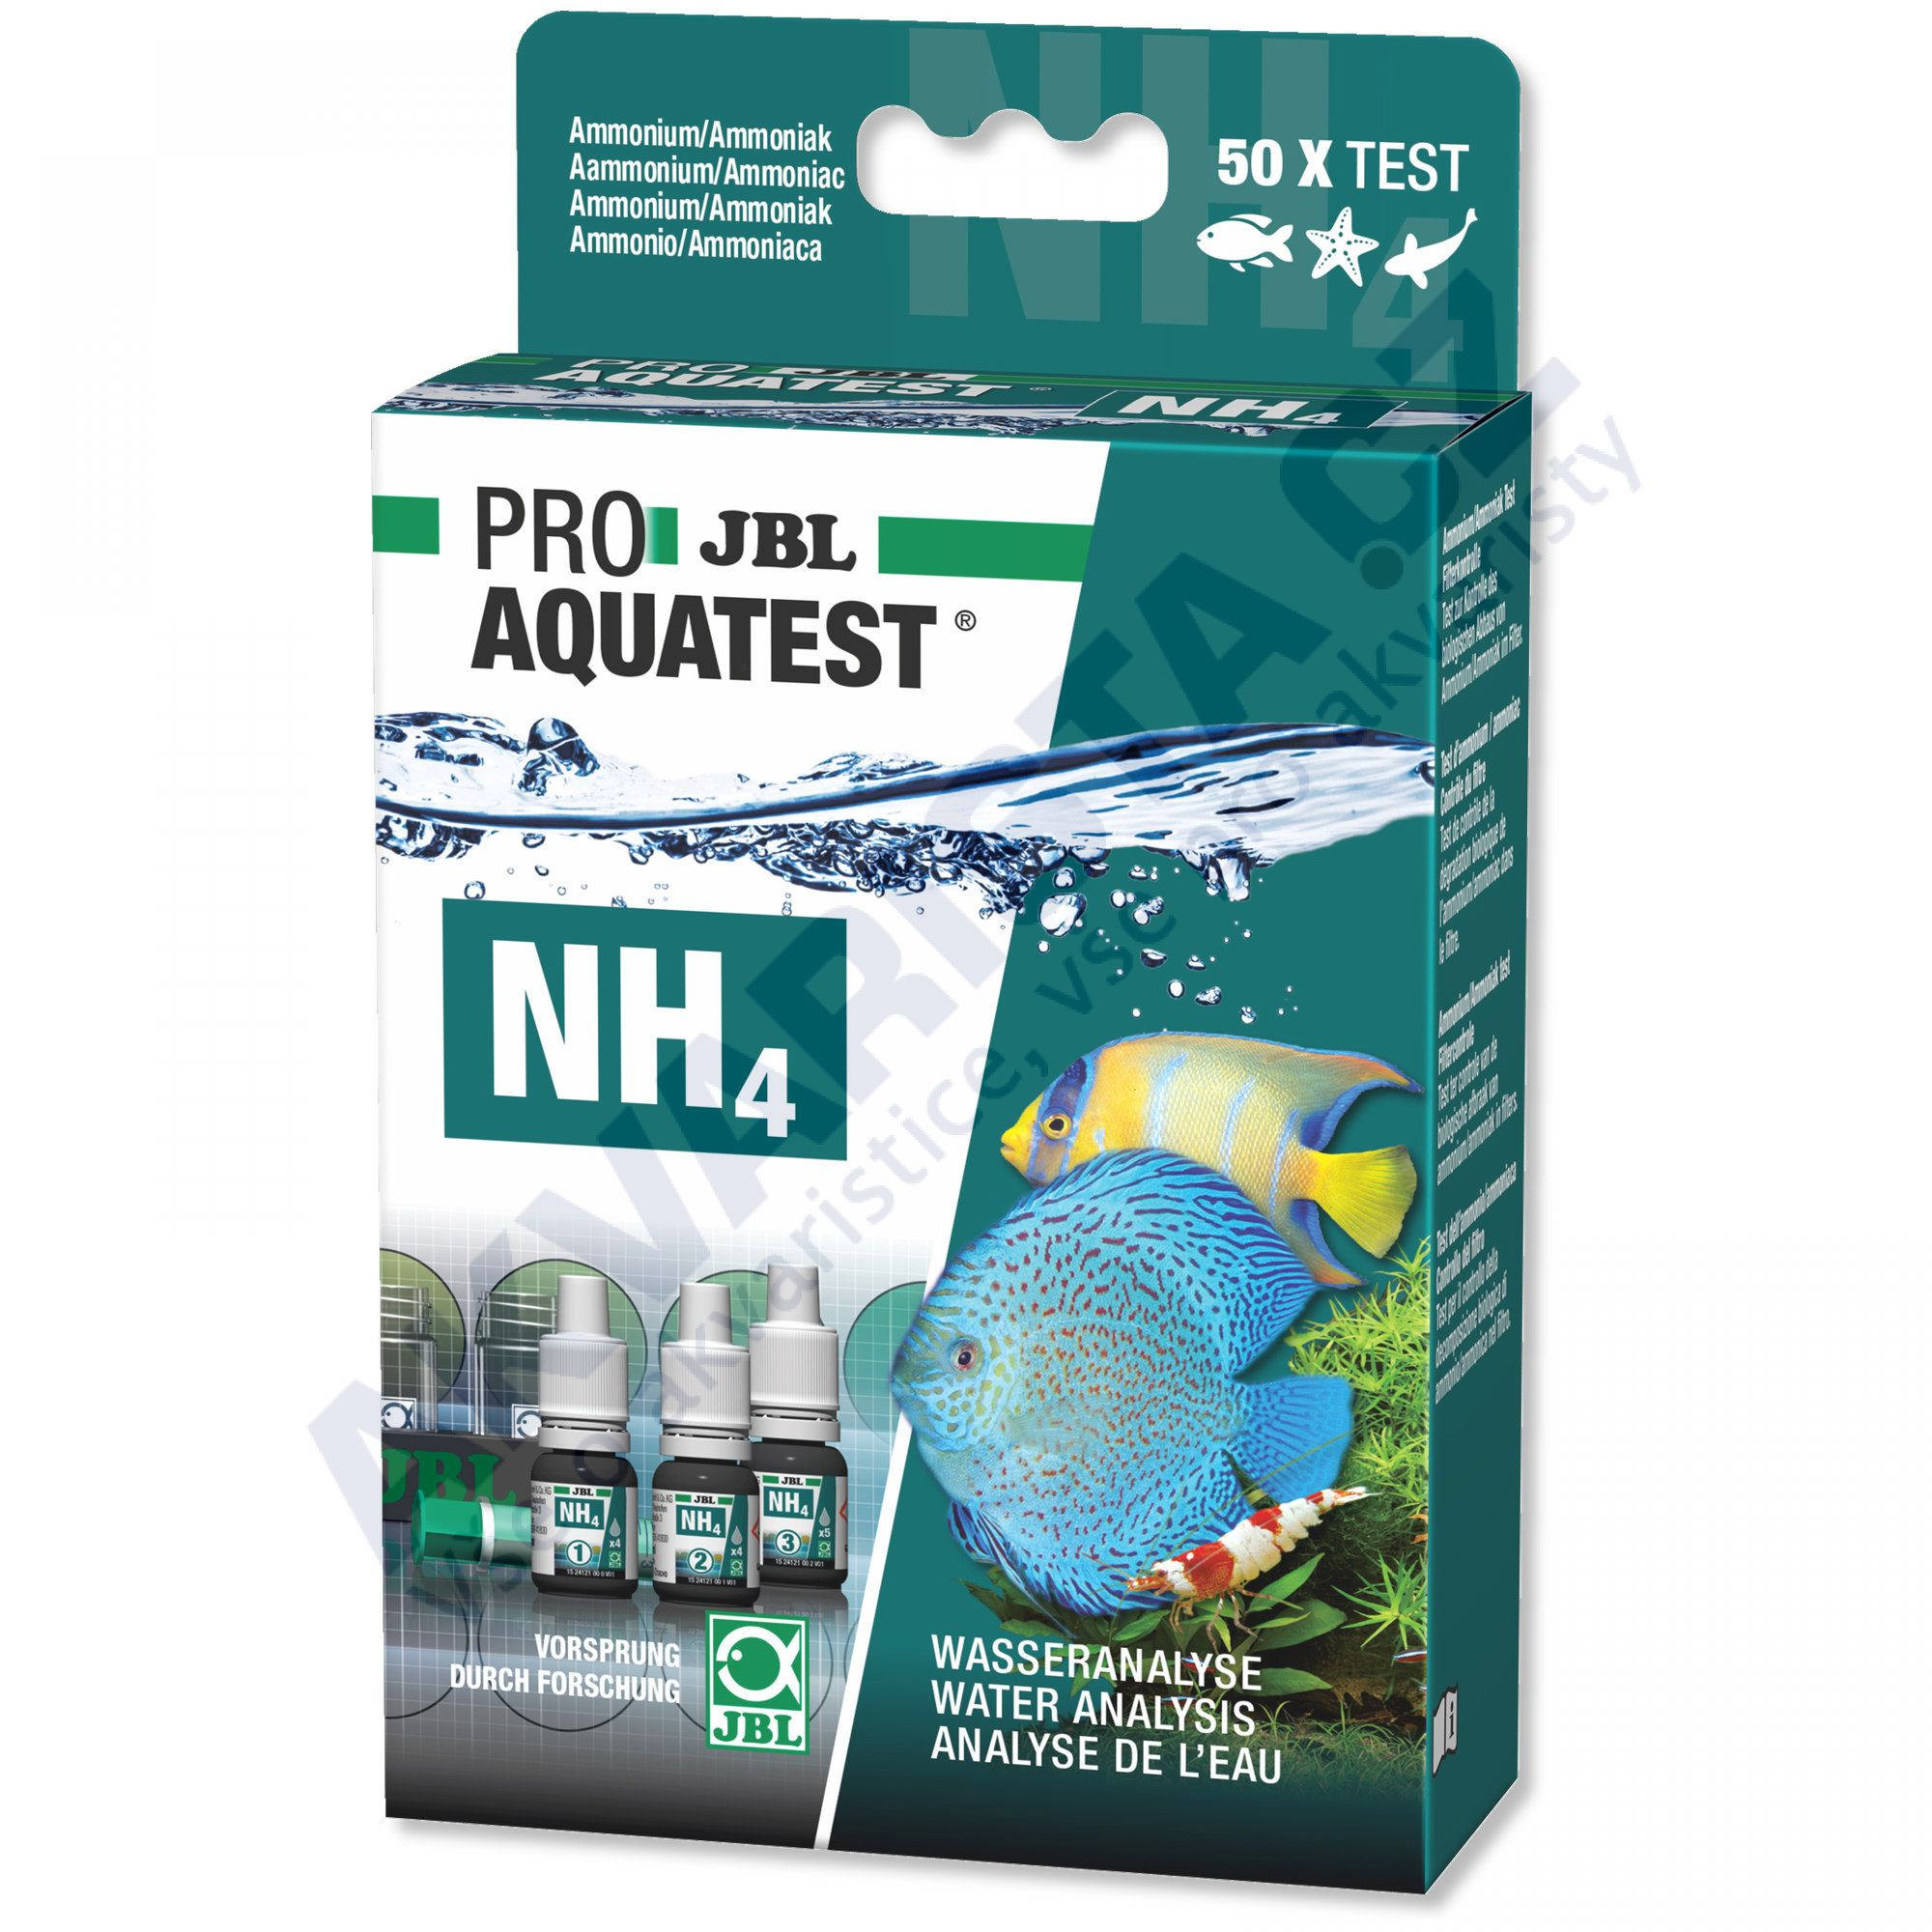 JBL PRO Aquatest NH4 (amonium)